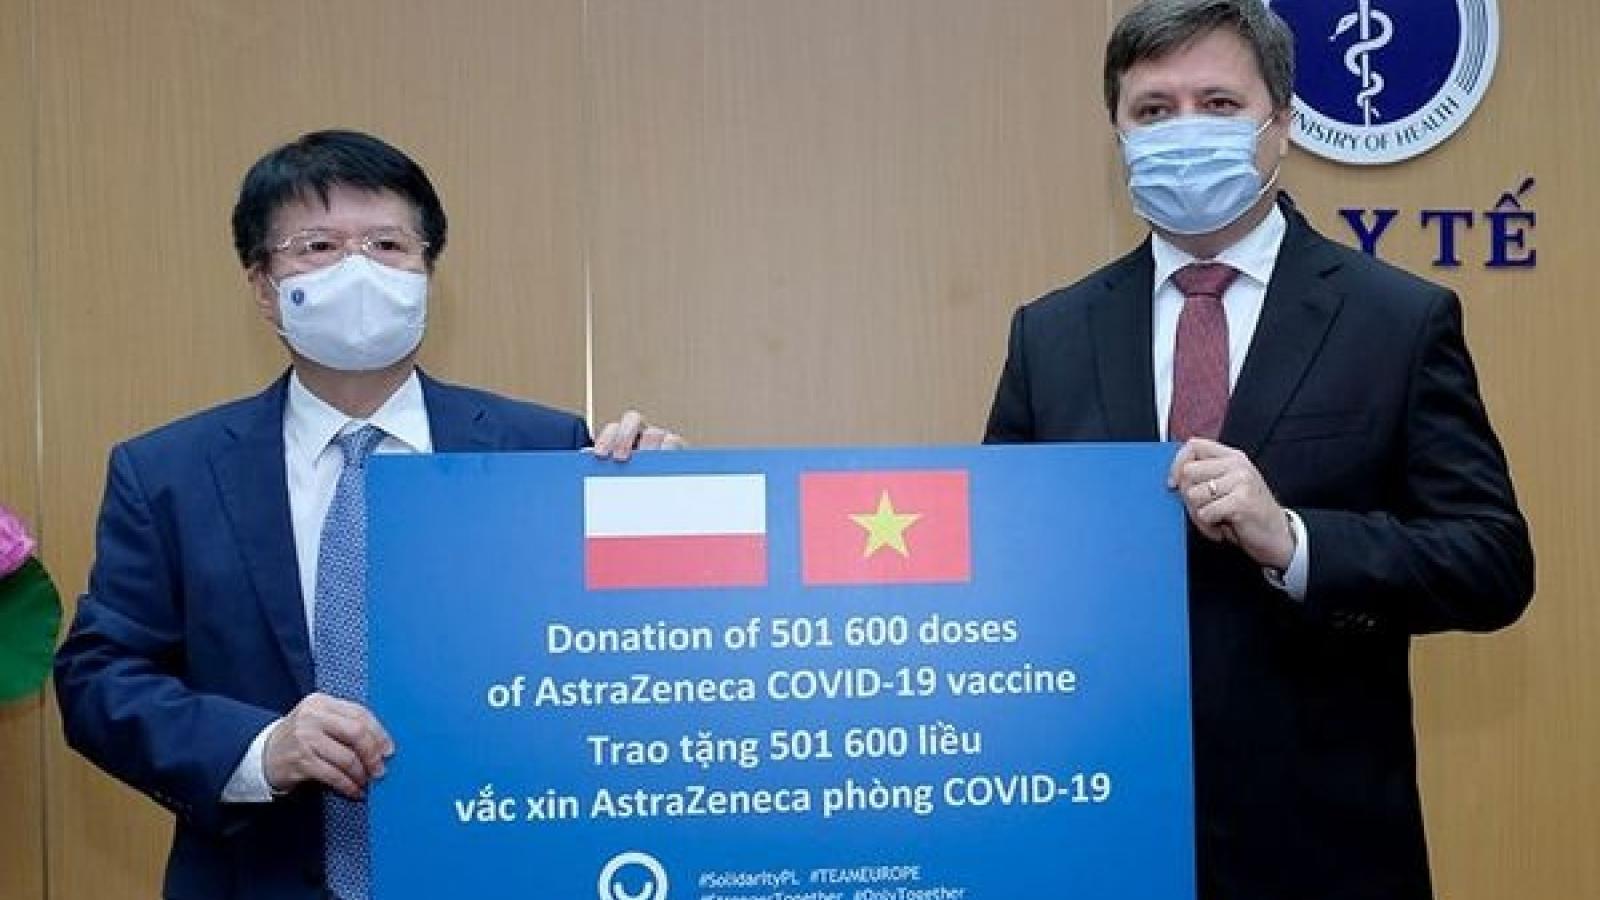 Vietnam receives over 500,000 doses of AstraZeneca vaccine from Poland